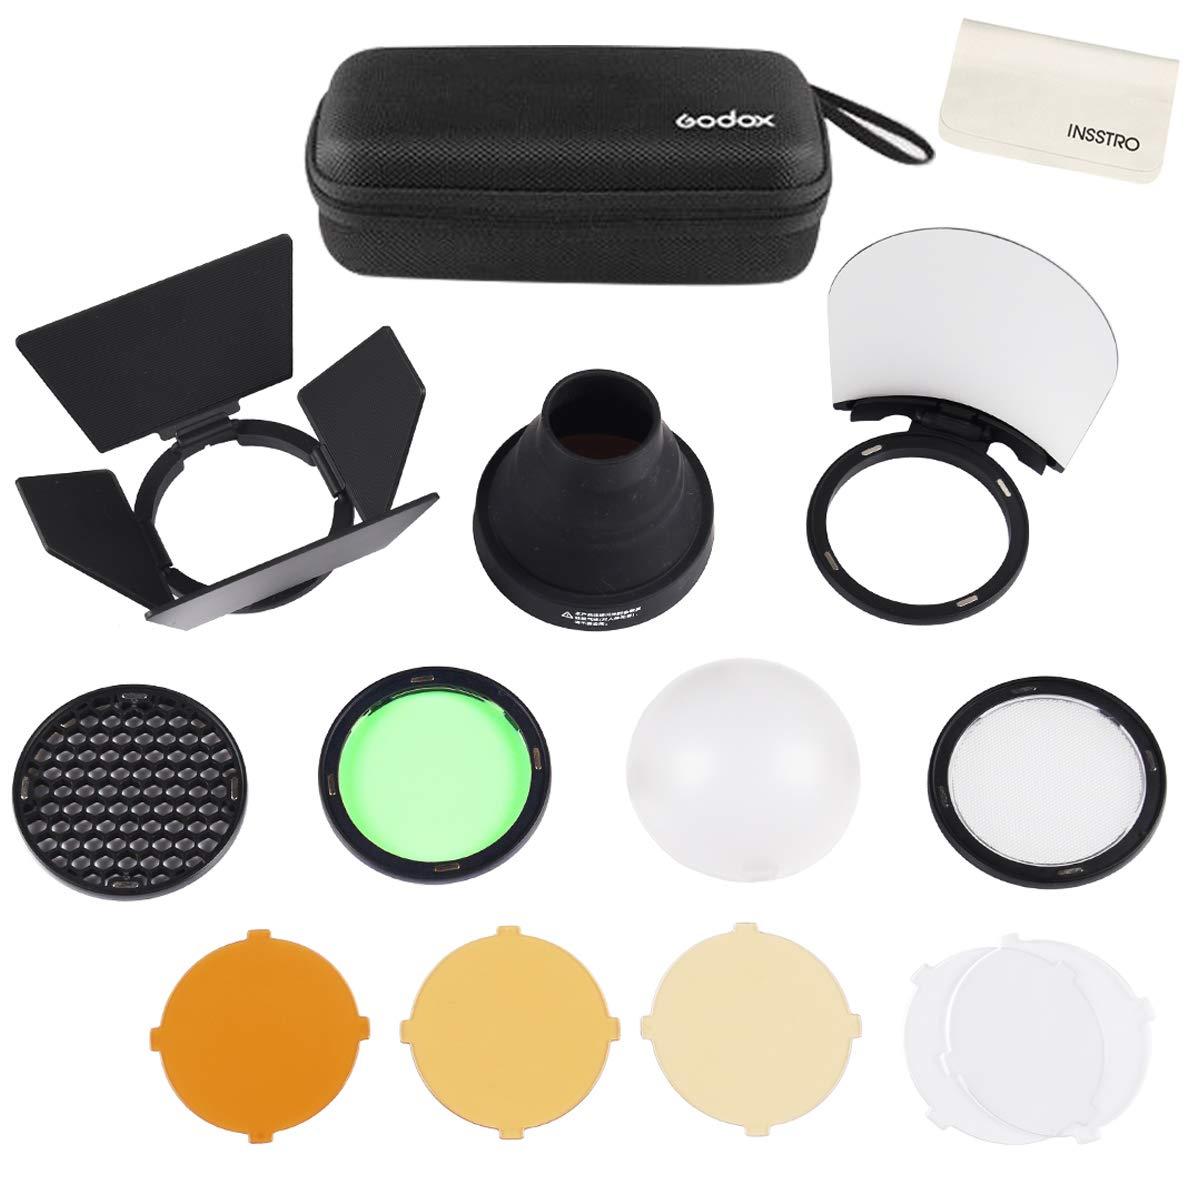 Godox AK-R1 Accessories Kit for Godox H200R Ring Flash Head Godox AD200 Accessories wth Magnetic Port Easy to Use